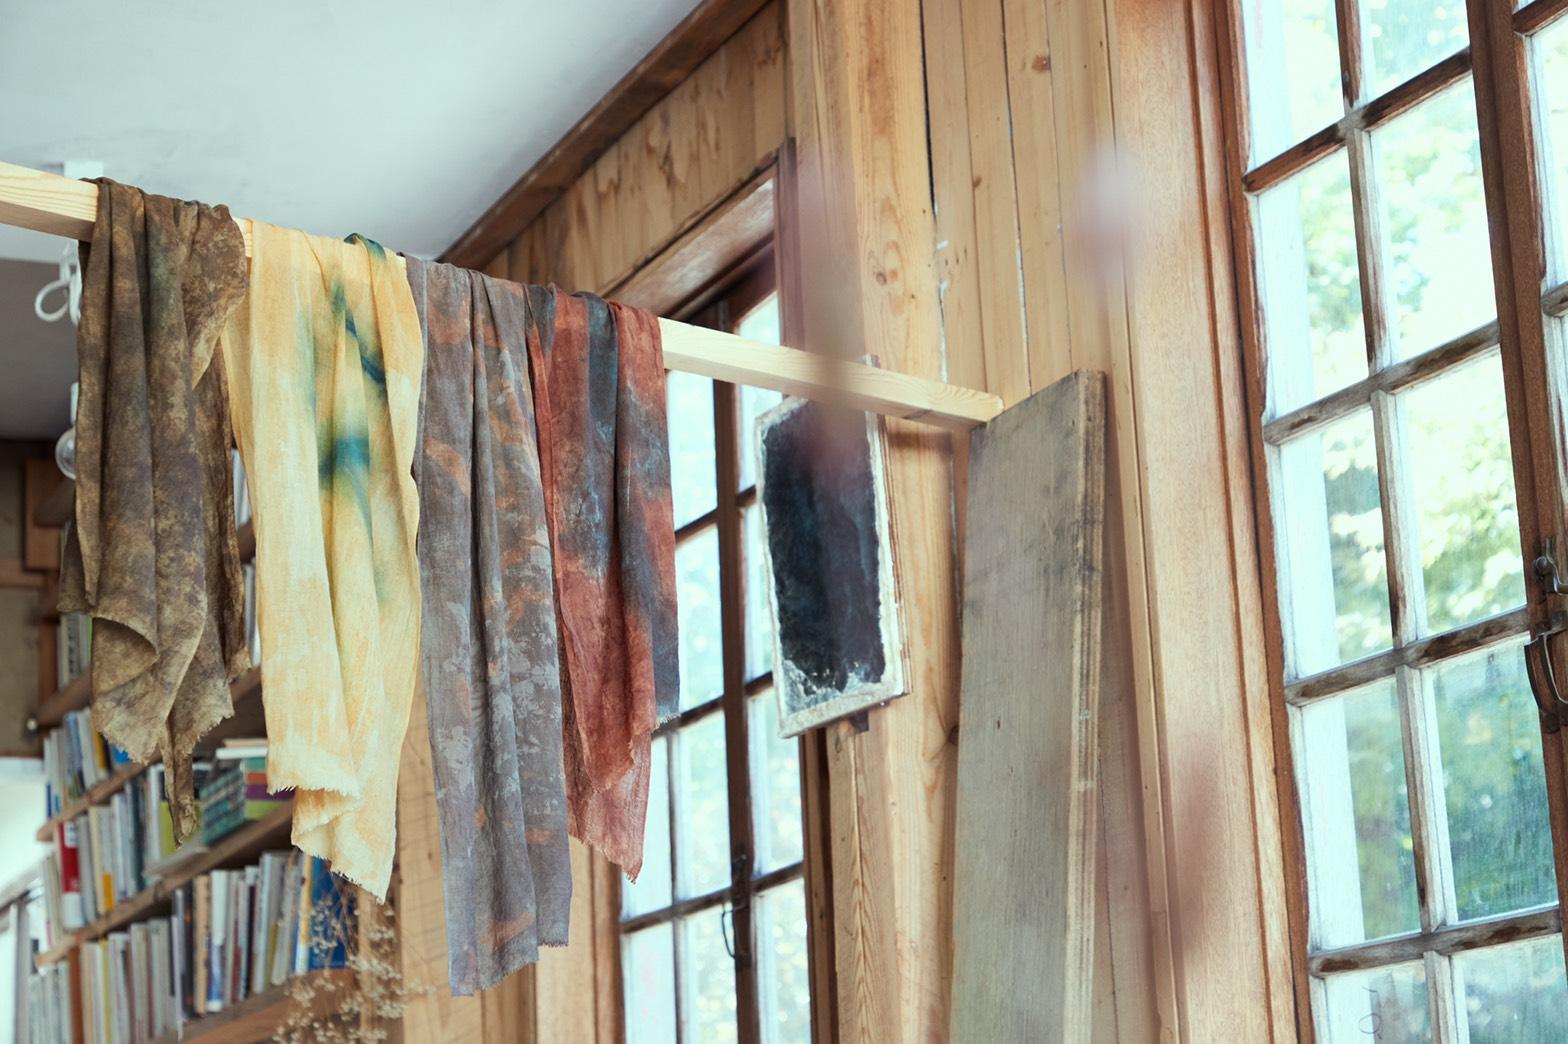 JAPAN 47ARTISTS×CASA FLINE PROJECT 藝術 芸術5